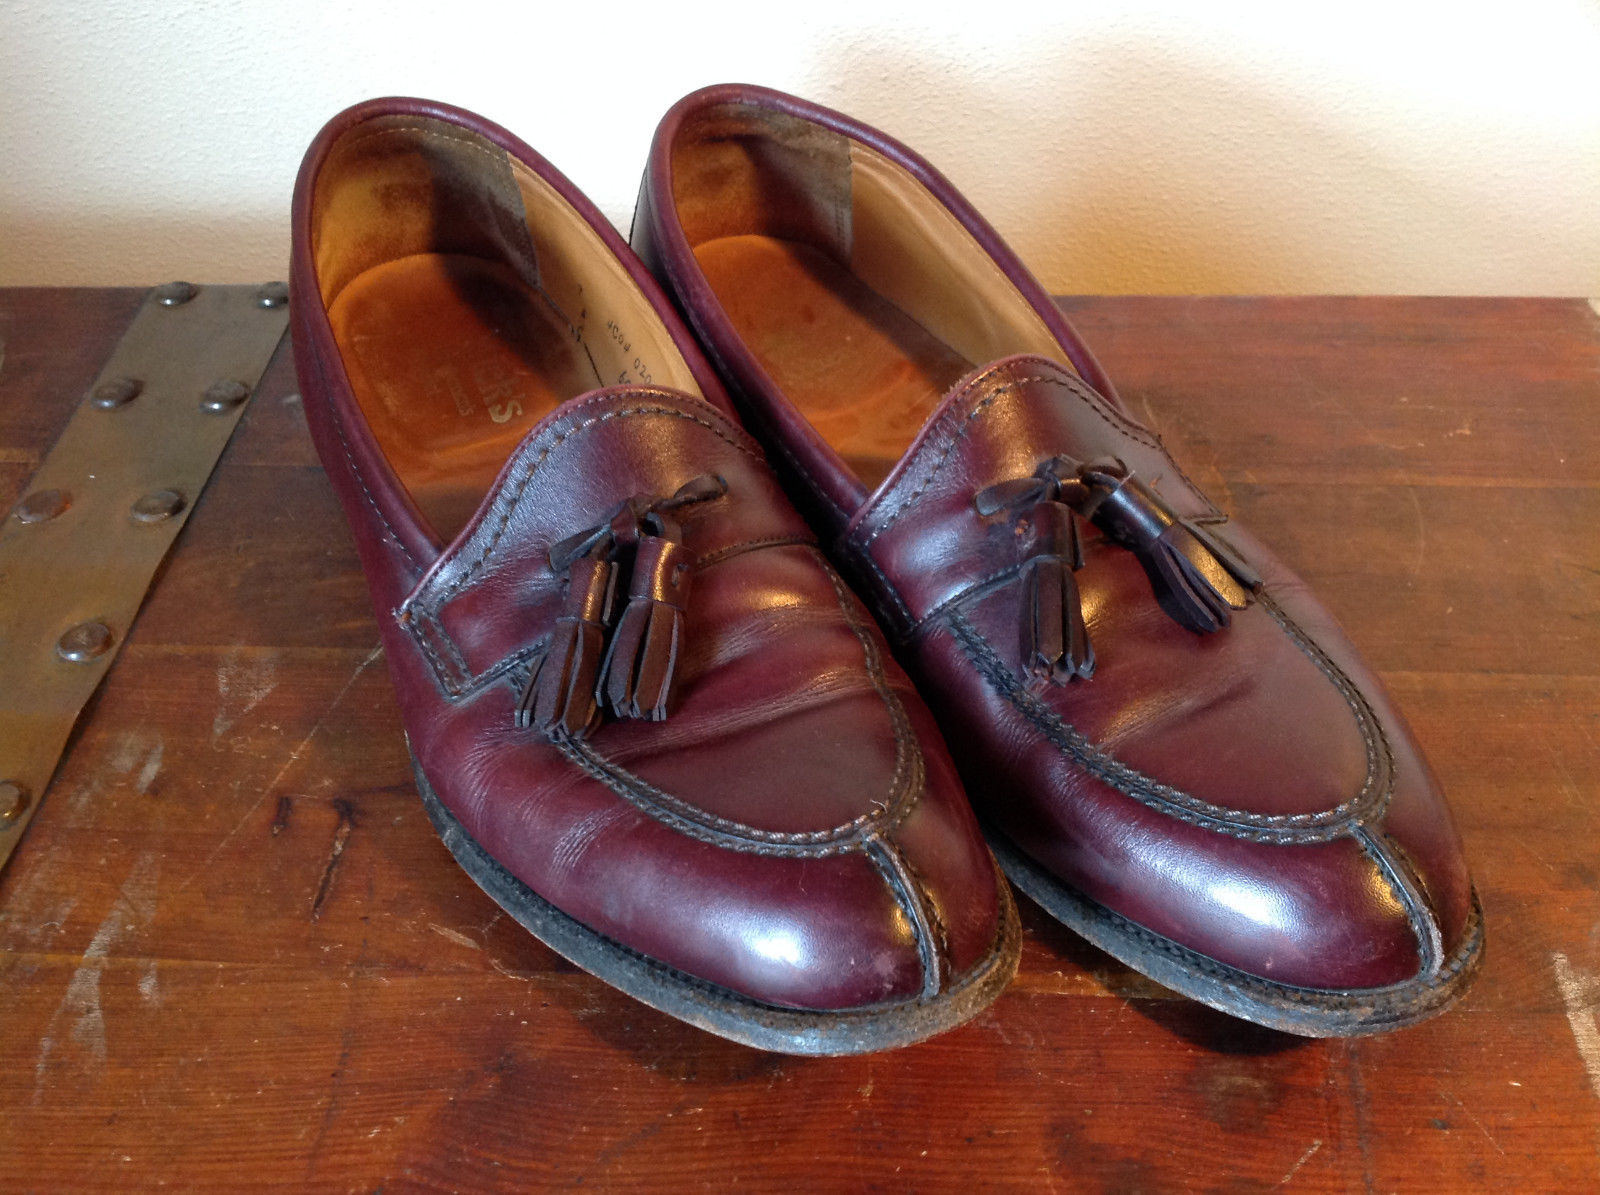 Alden Leather Tassel Loafer Burgundy Shoes Made in USA Doe Tail Heel Size 9